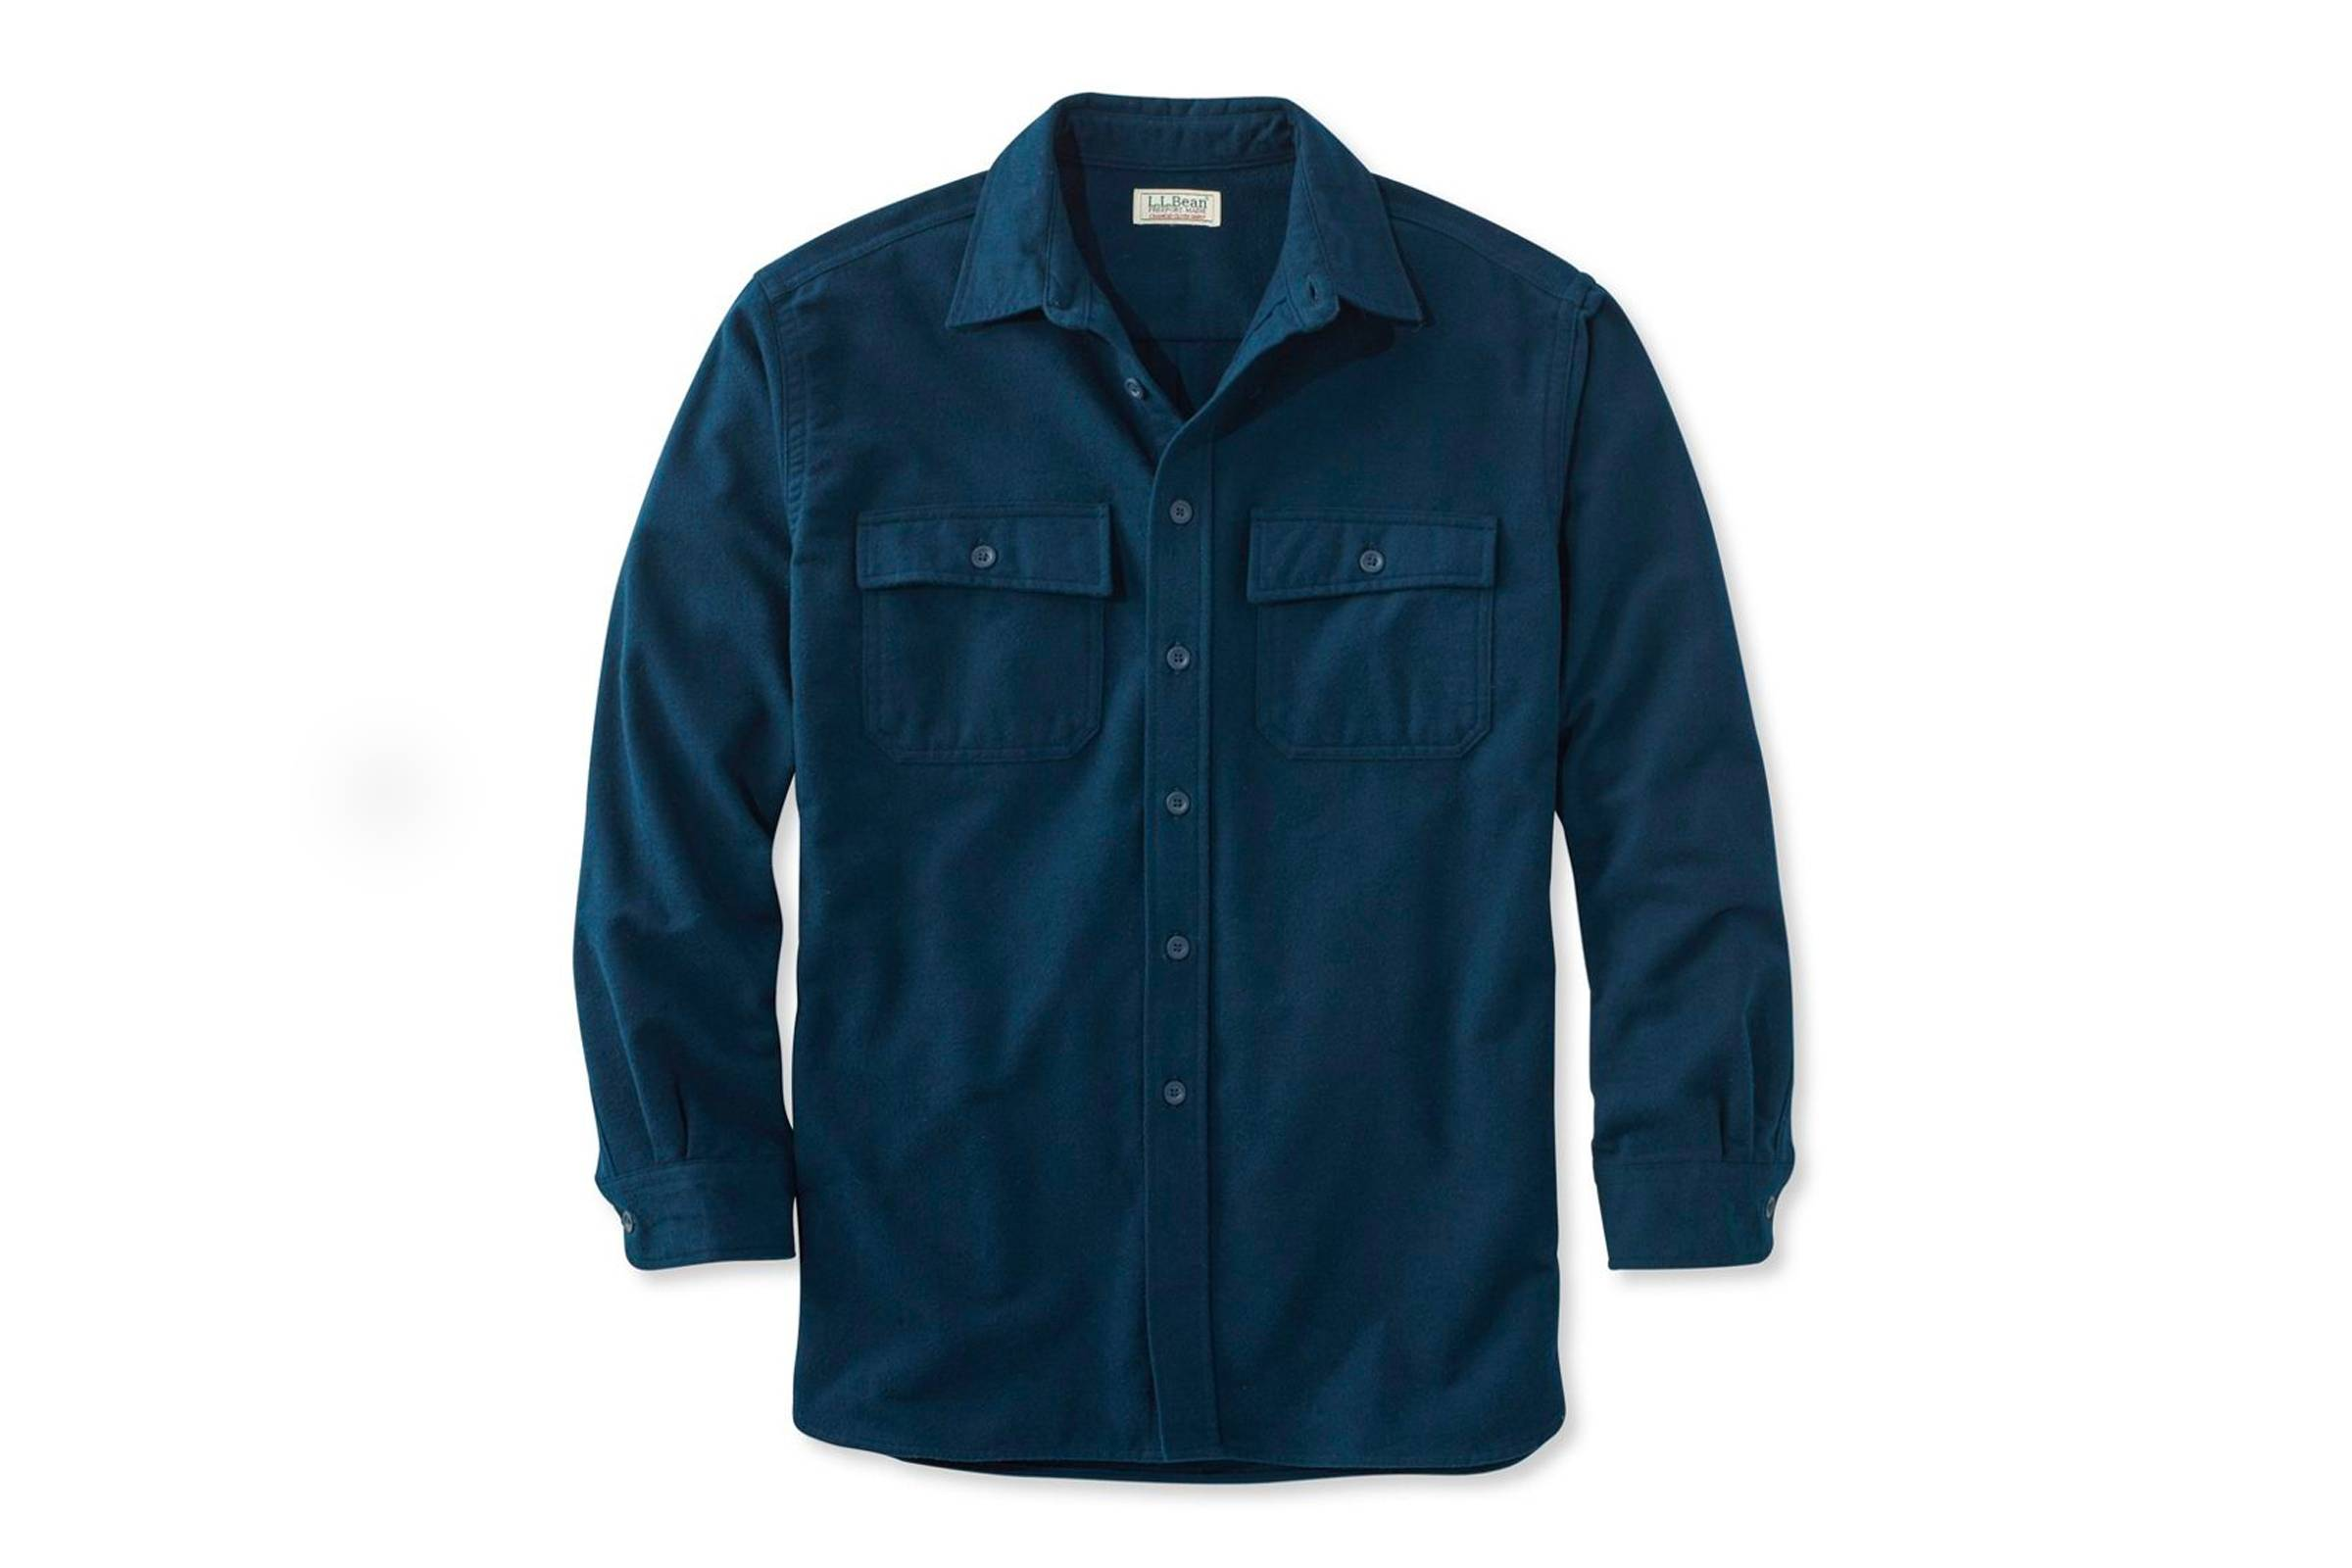 1. L.L. Bean Chamois Shirt